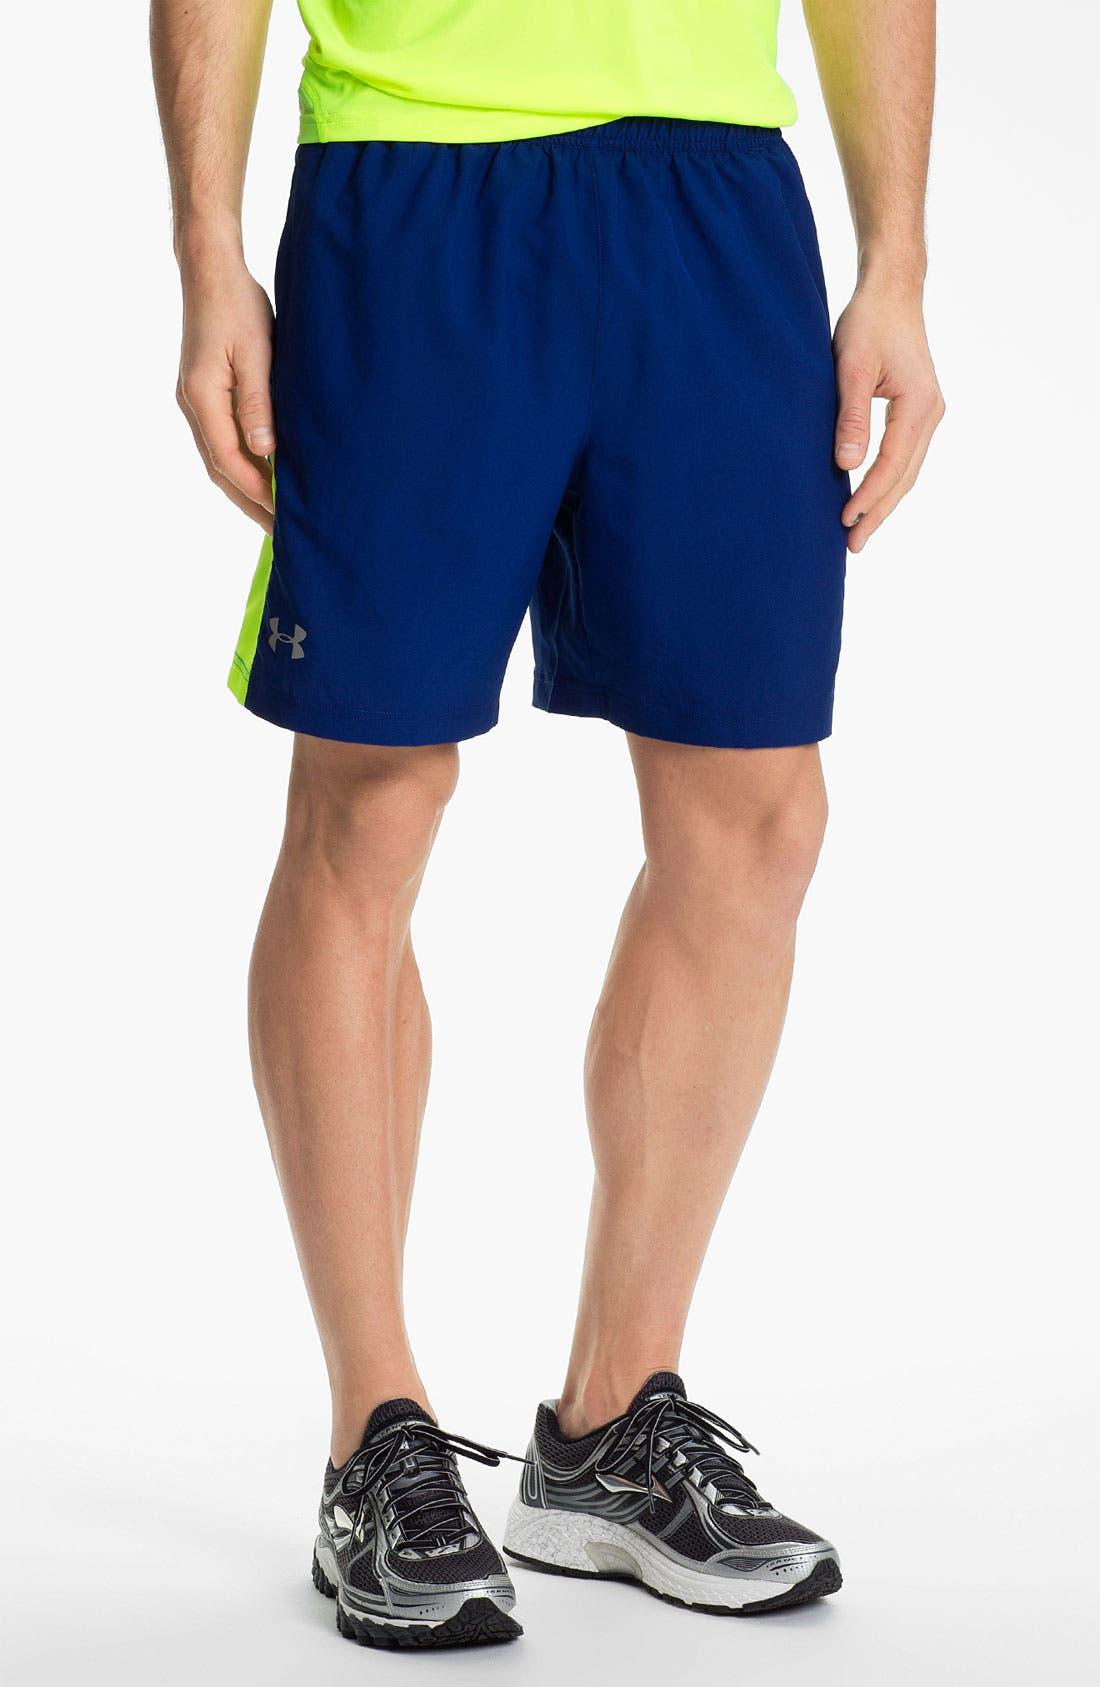 Main Image - Under Armour 'Shirtless Run' Shorts